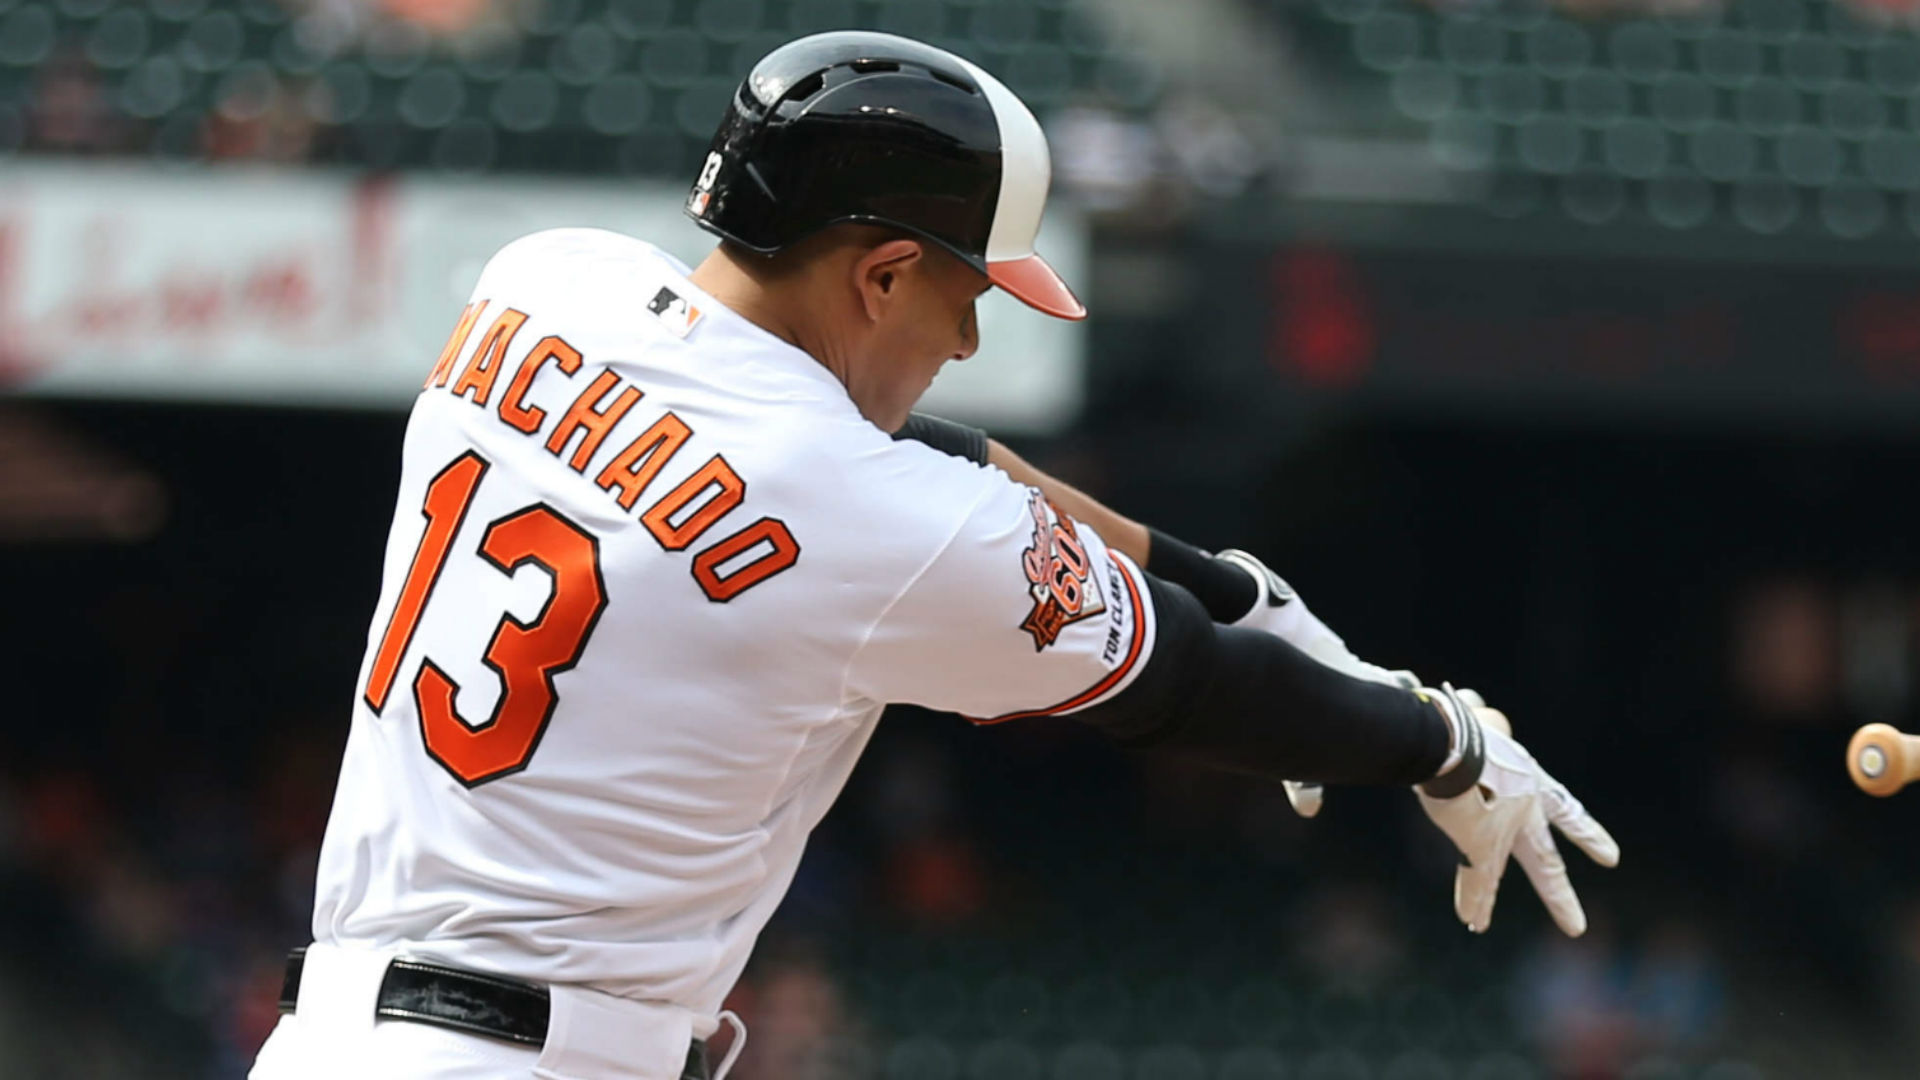 Manny-Machado-61014-FTR-ap